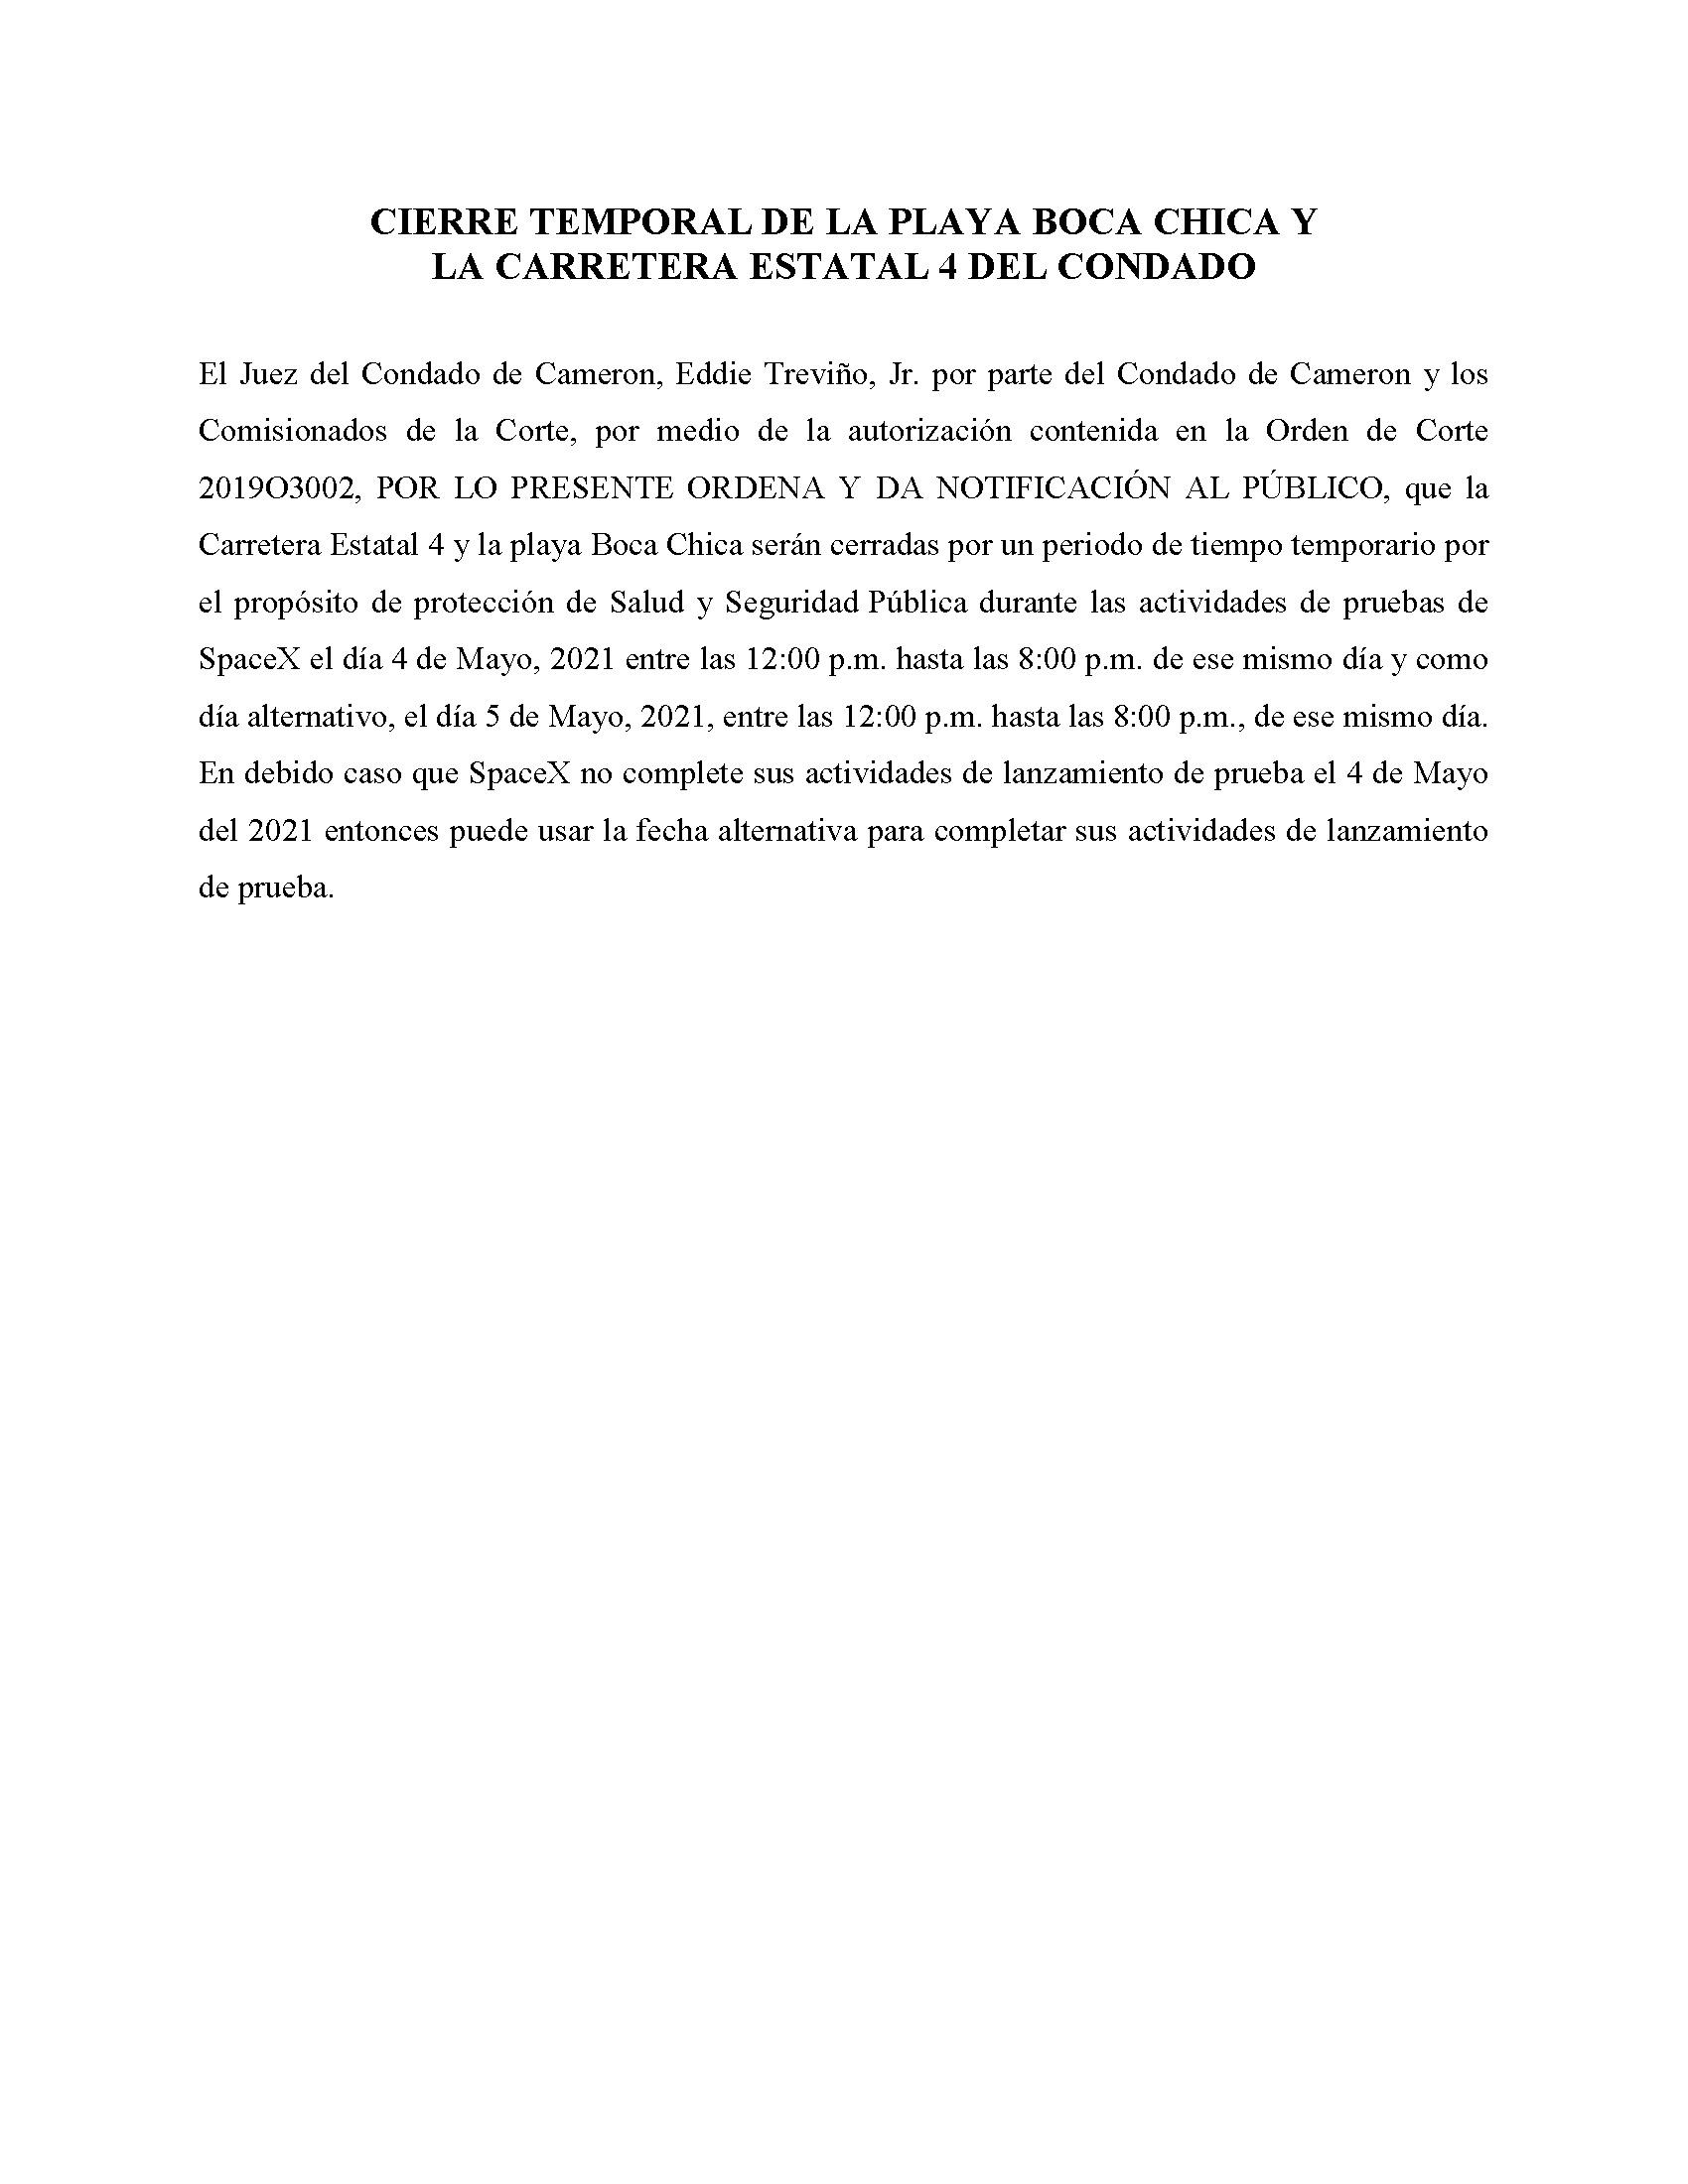 ORDER.CLOSURE OF HIGHWAY 4 Y LA PLAYA BOCA CHICA.SPANISH.05.04.2021